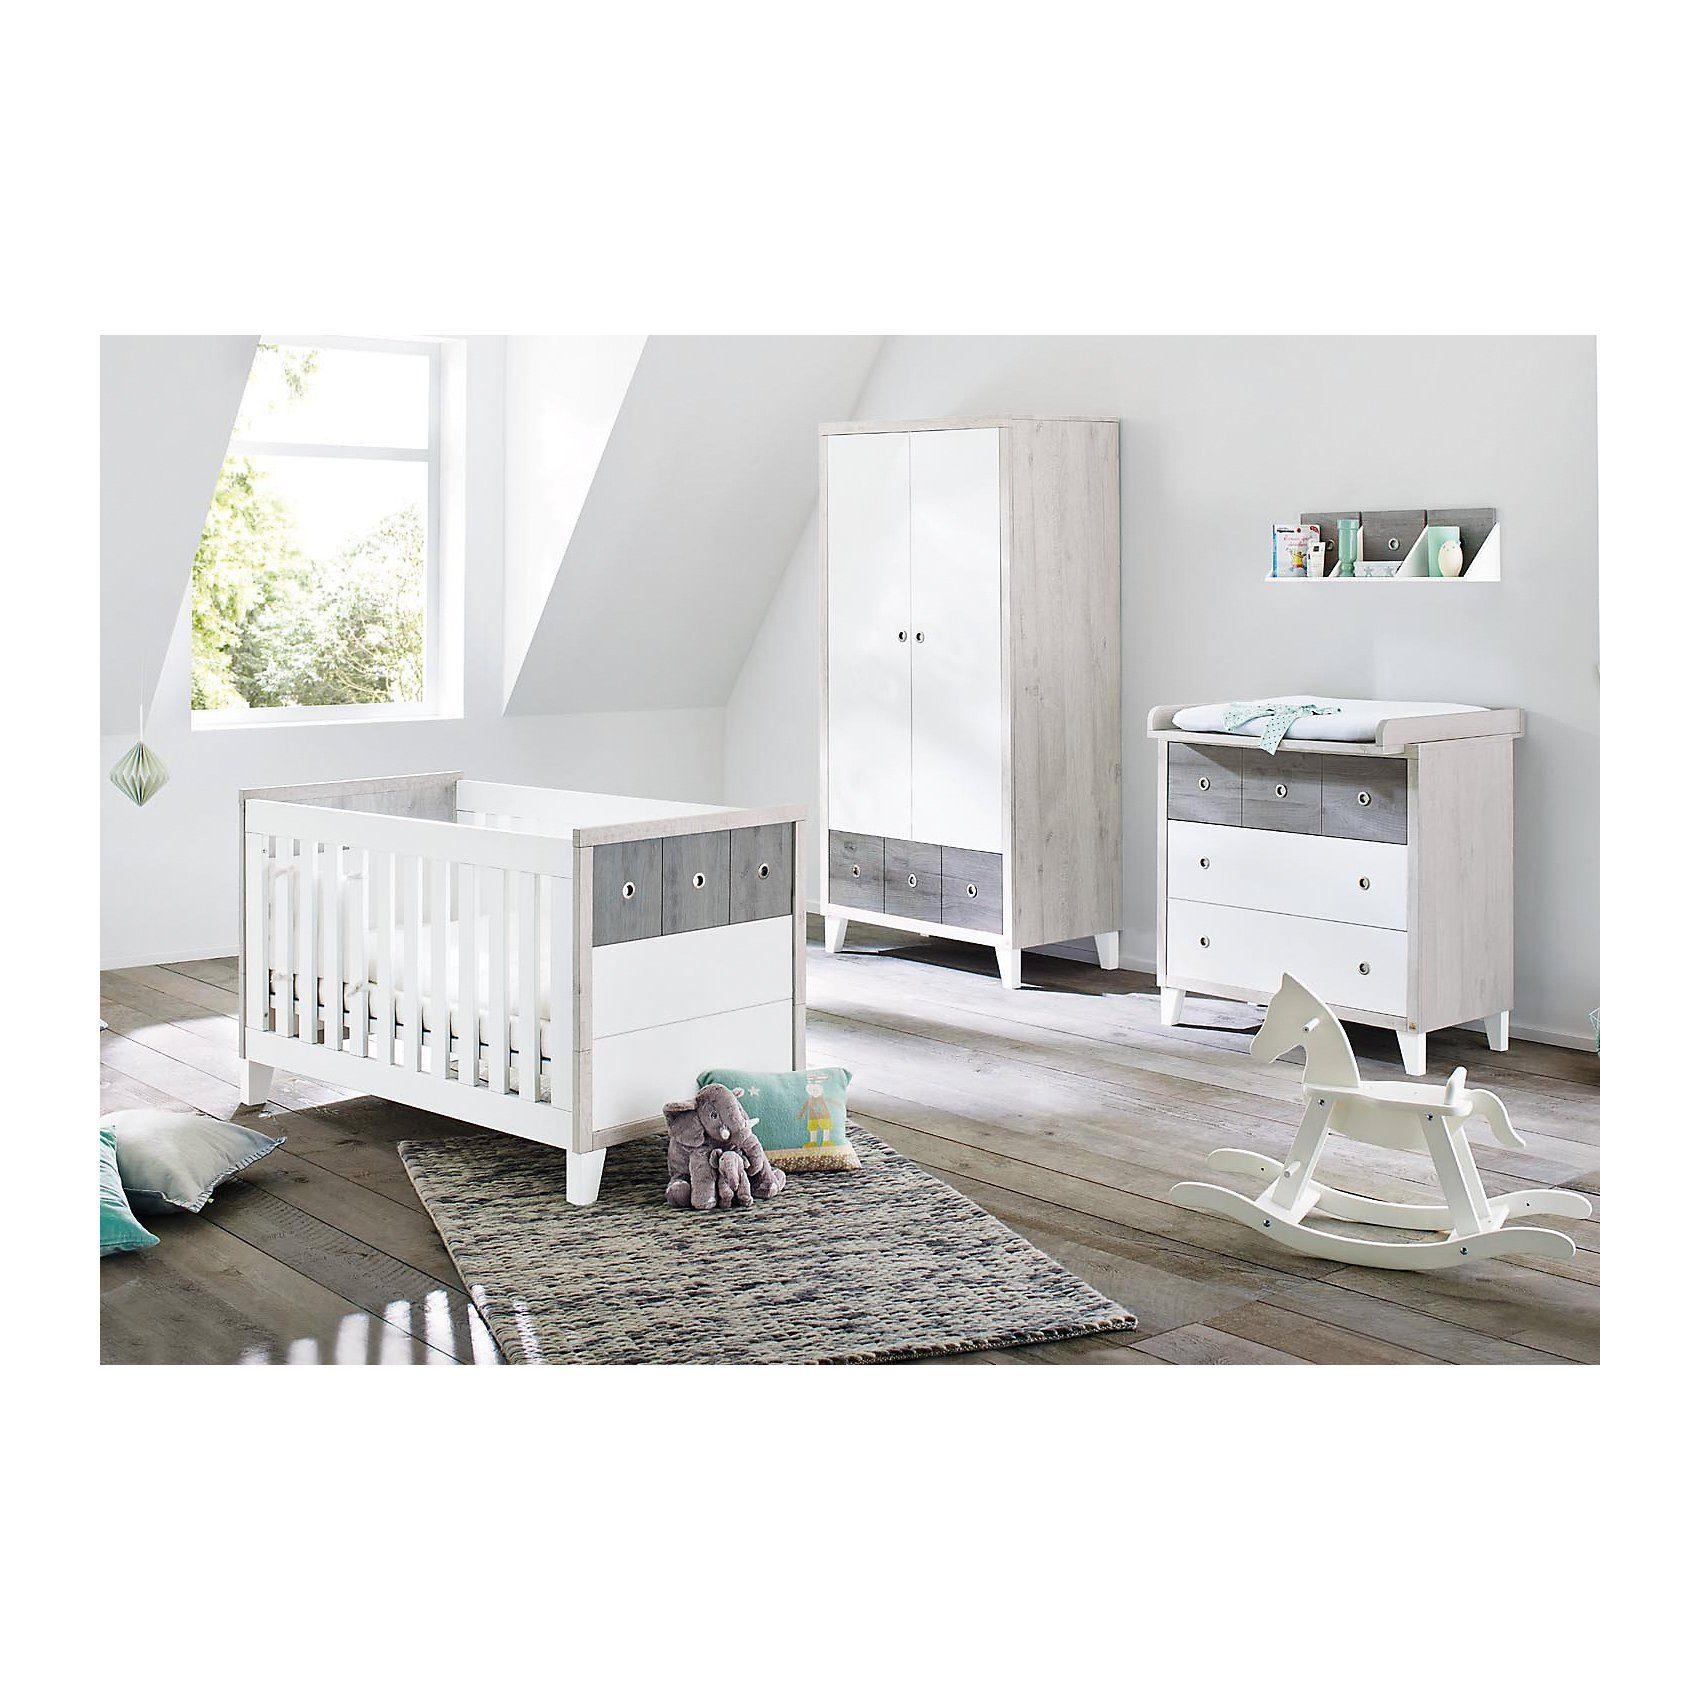 Pinolino Komplett Kinderzimmer HARPER, (Kinderbett, Wickelkommode und